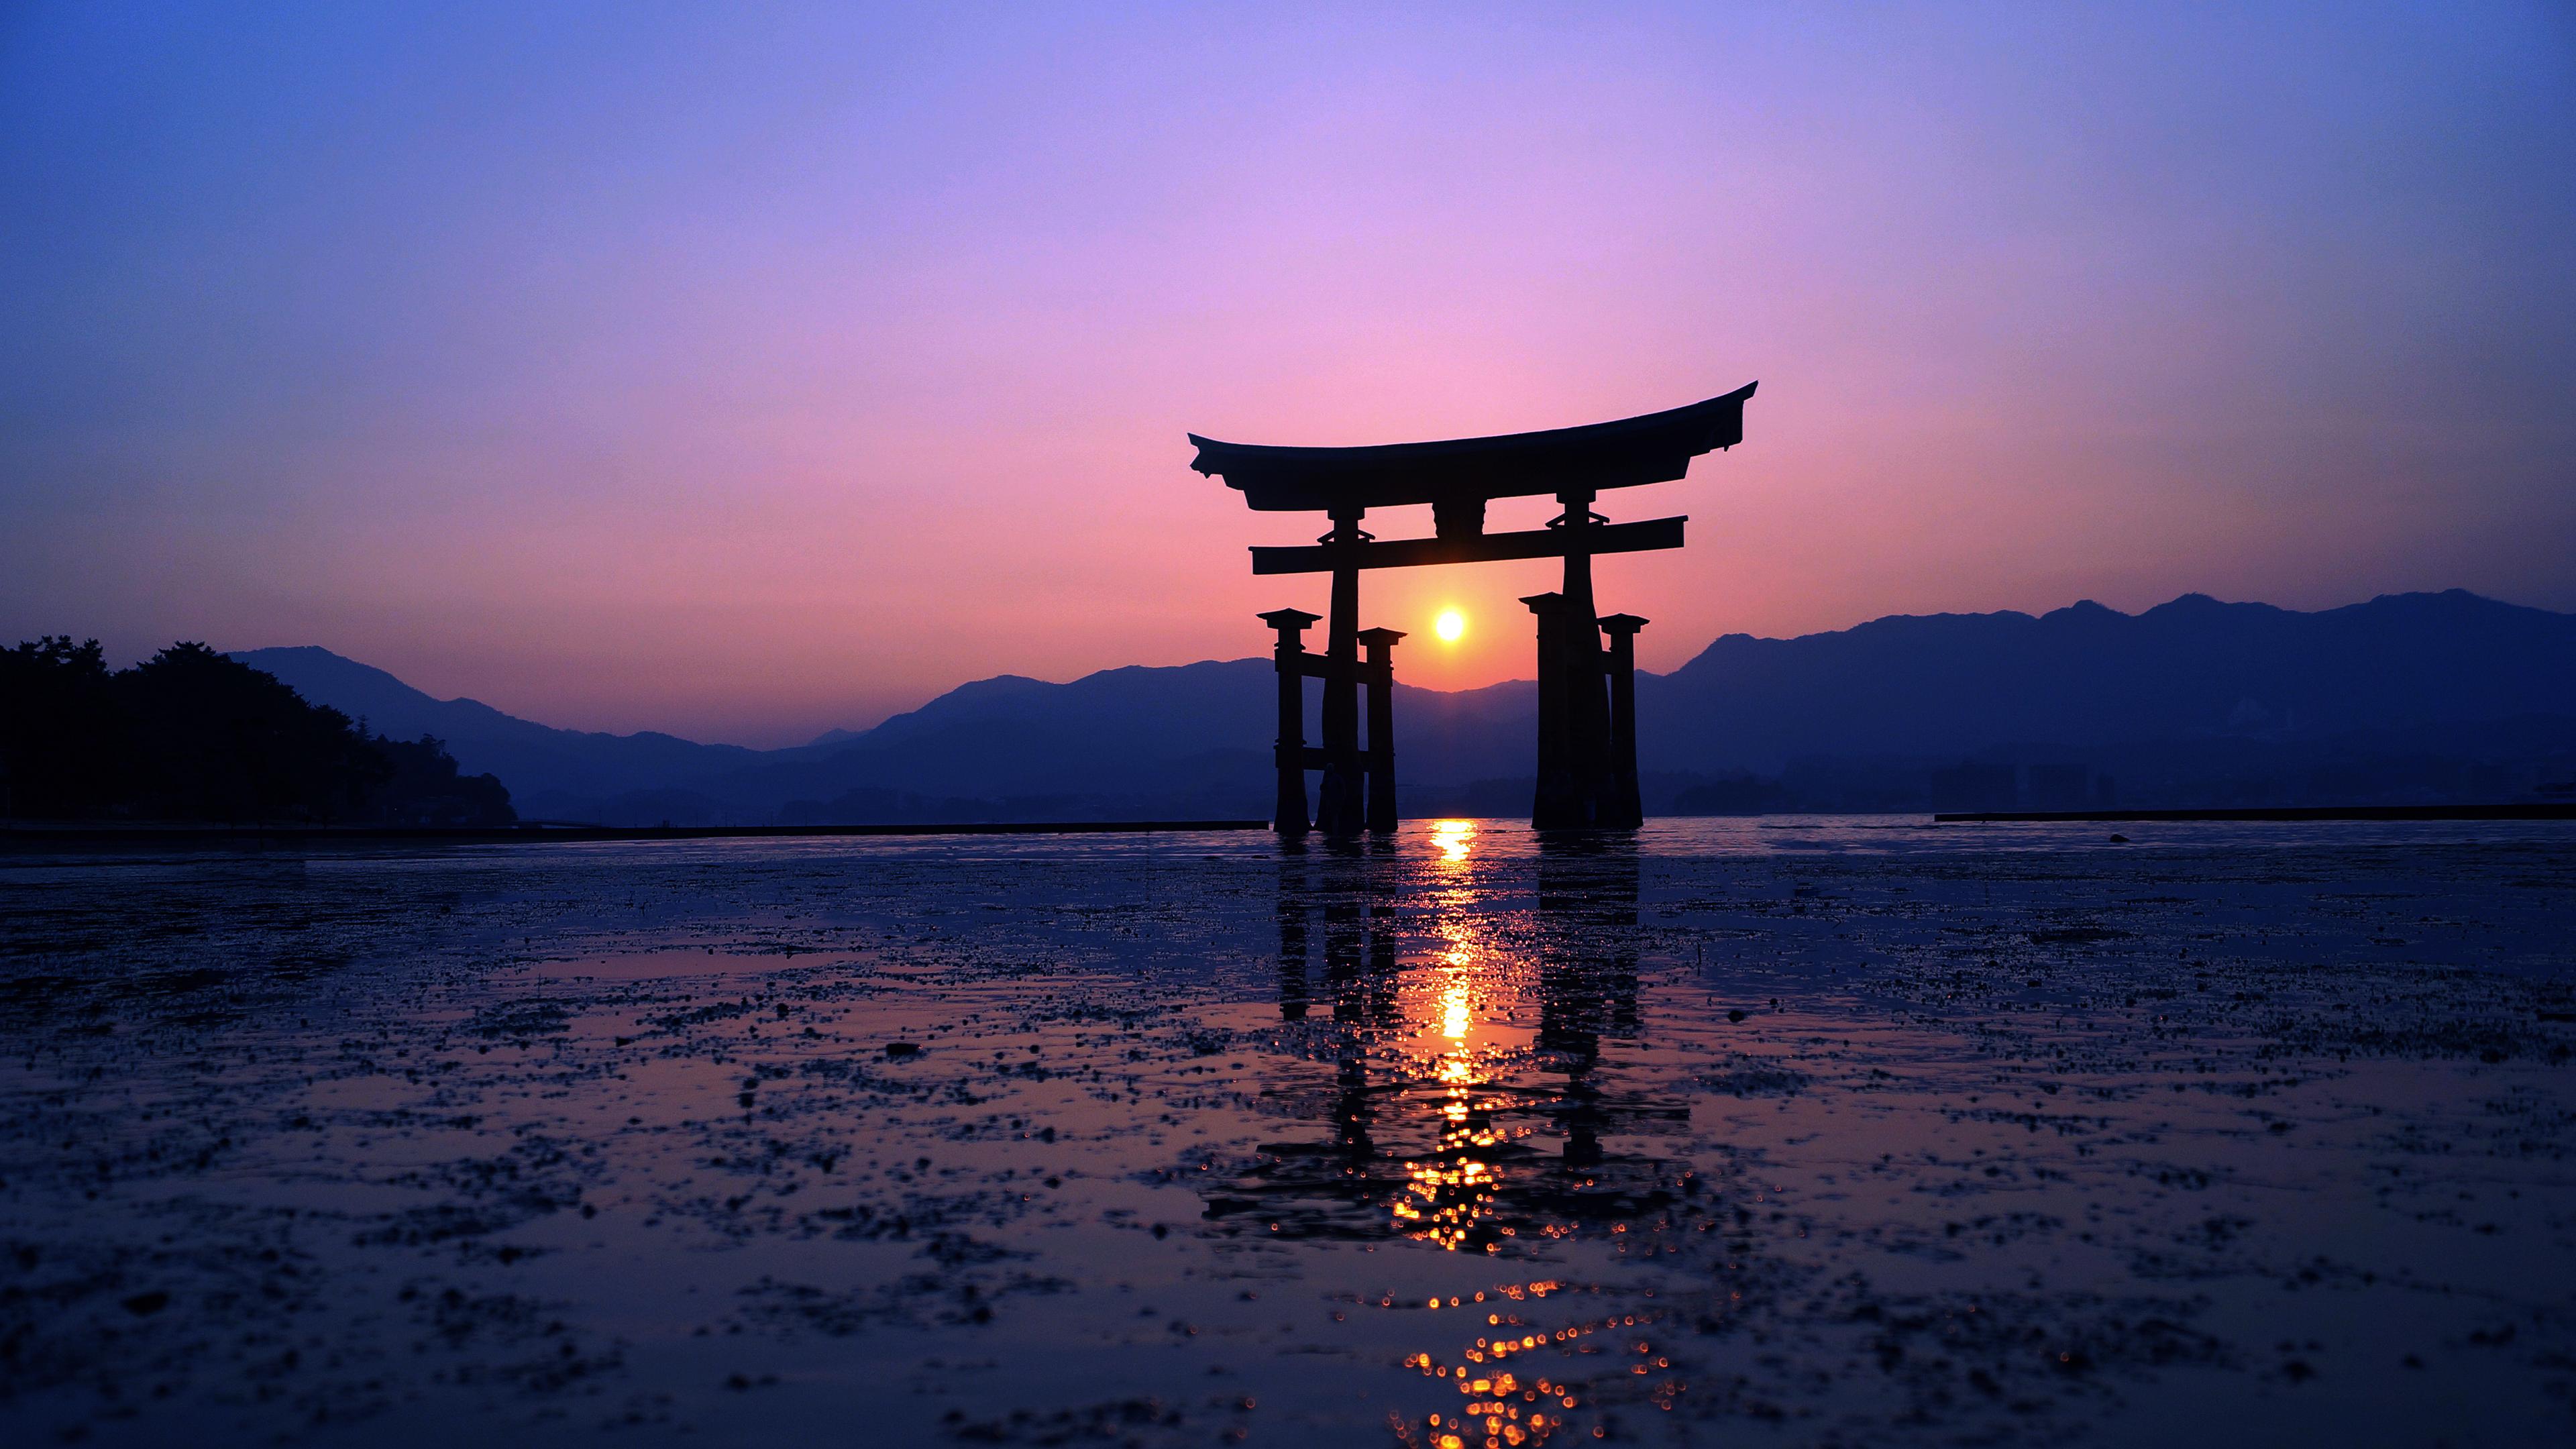 2048x2048 Serene Sunset Ipad Air Hd 4k Wallpapers Images: 2048x2048 Japan Sunset Purple Evening 4k Ipad Air HD 4k